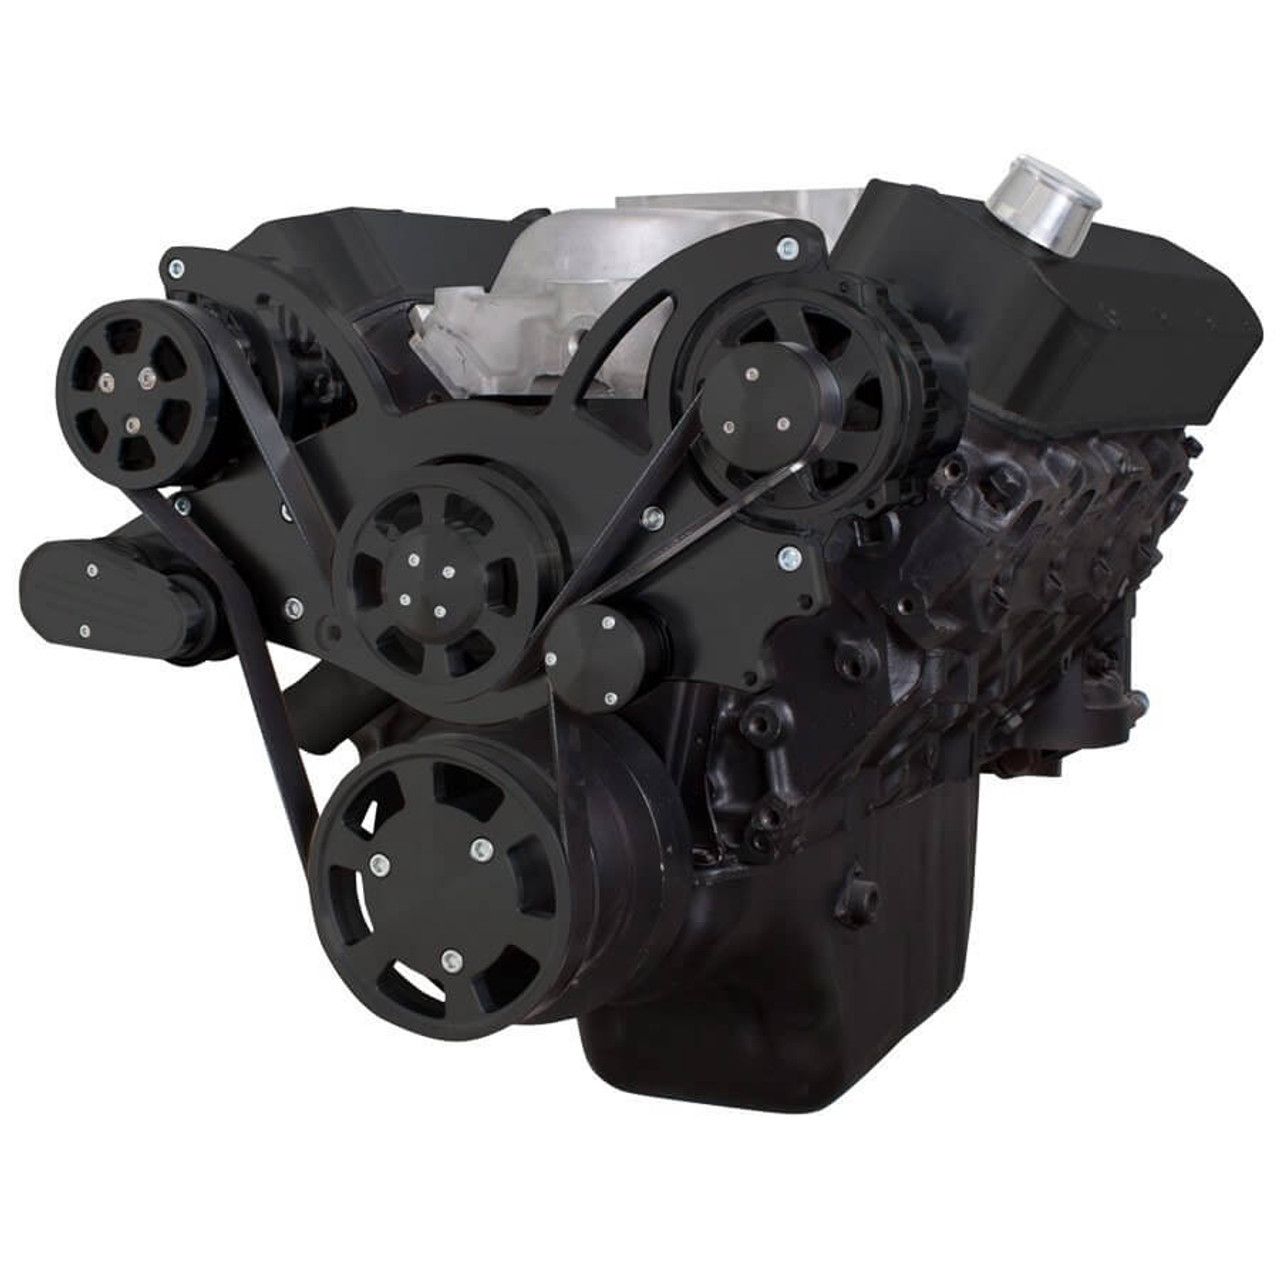 Black Serpentine System for Big Block Chevy Gen  VI & Alternator - All  Inclusive